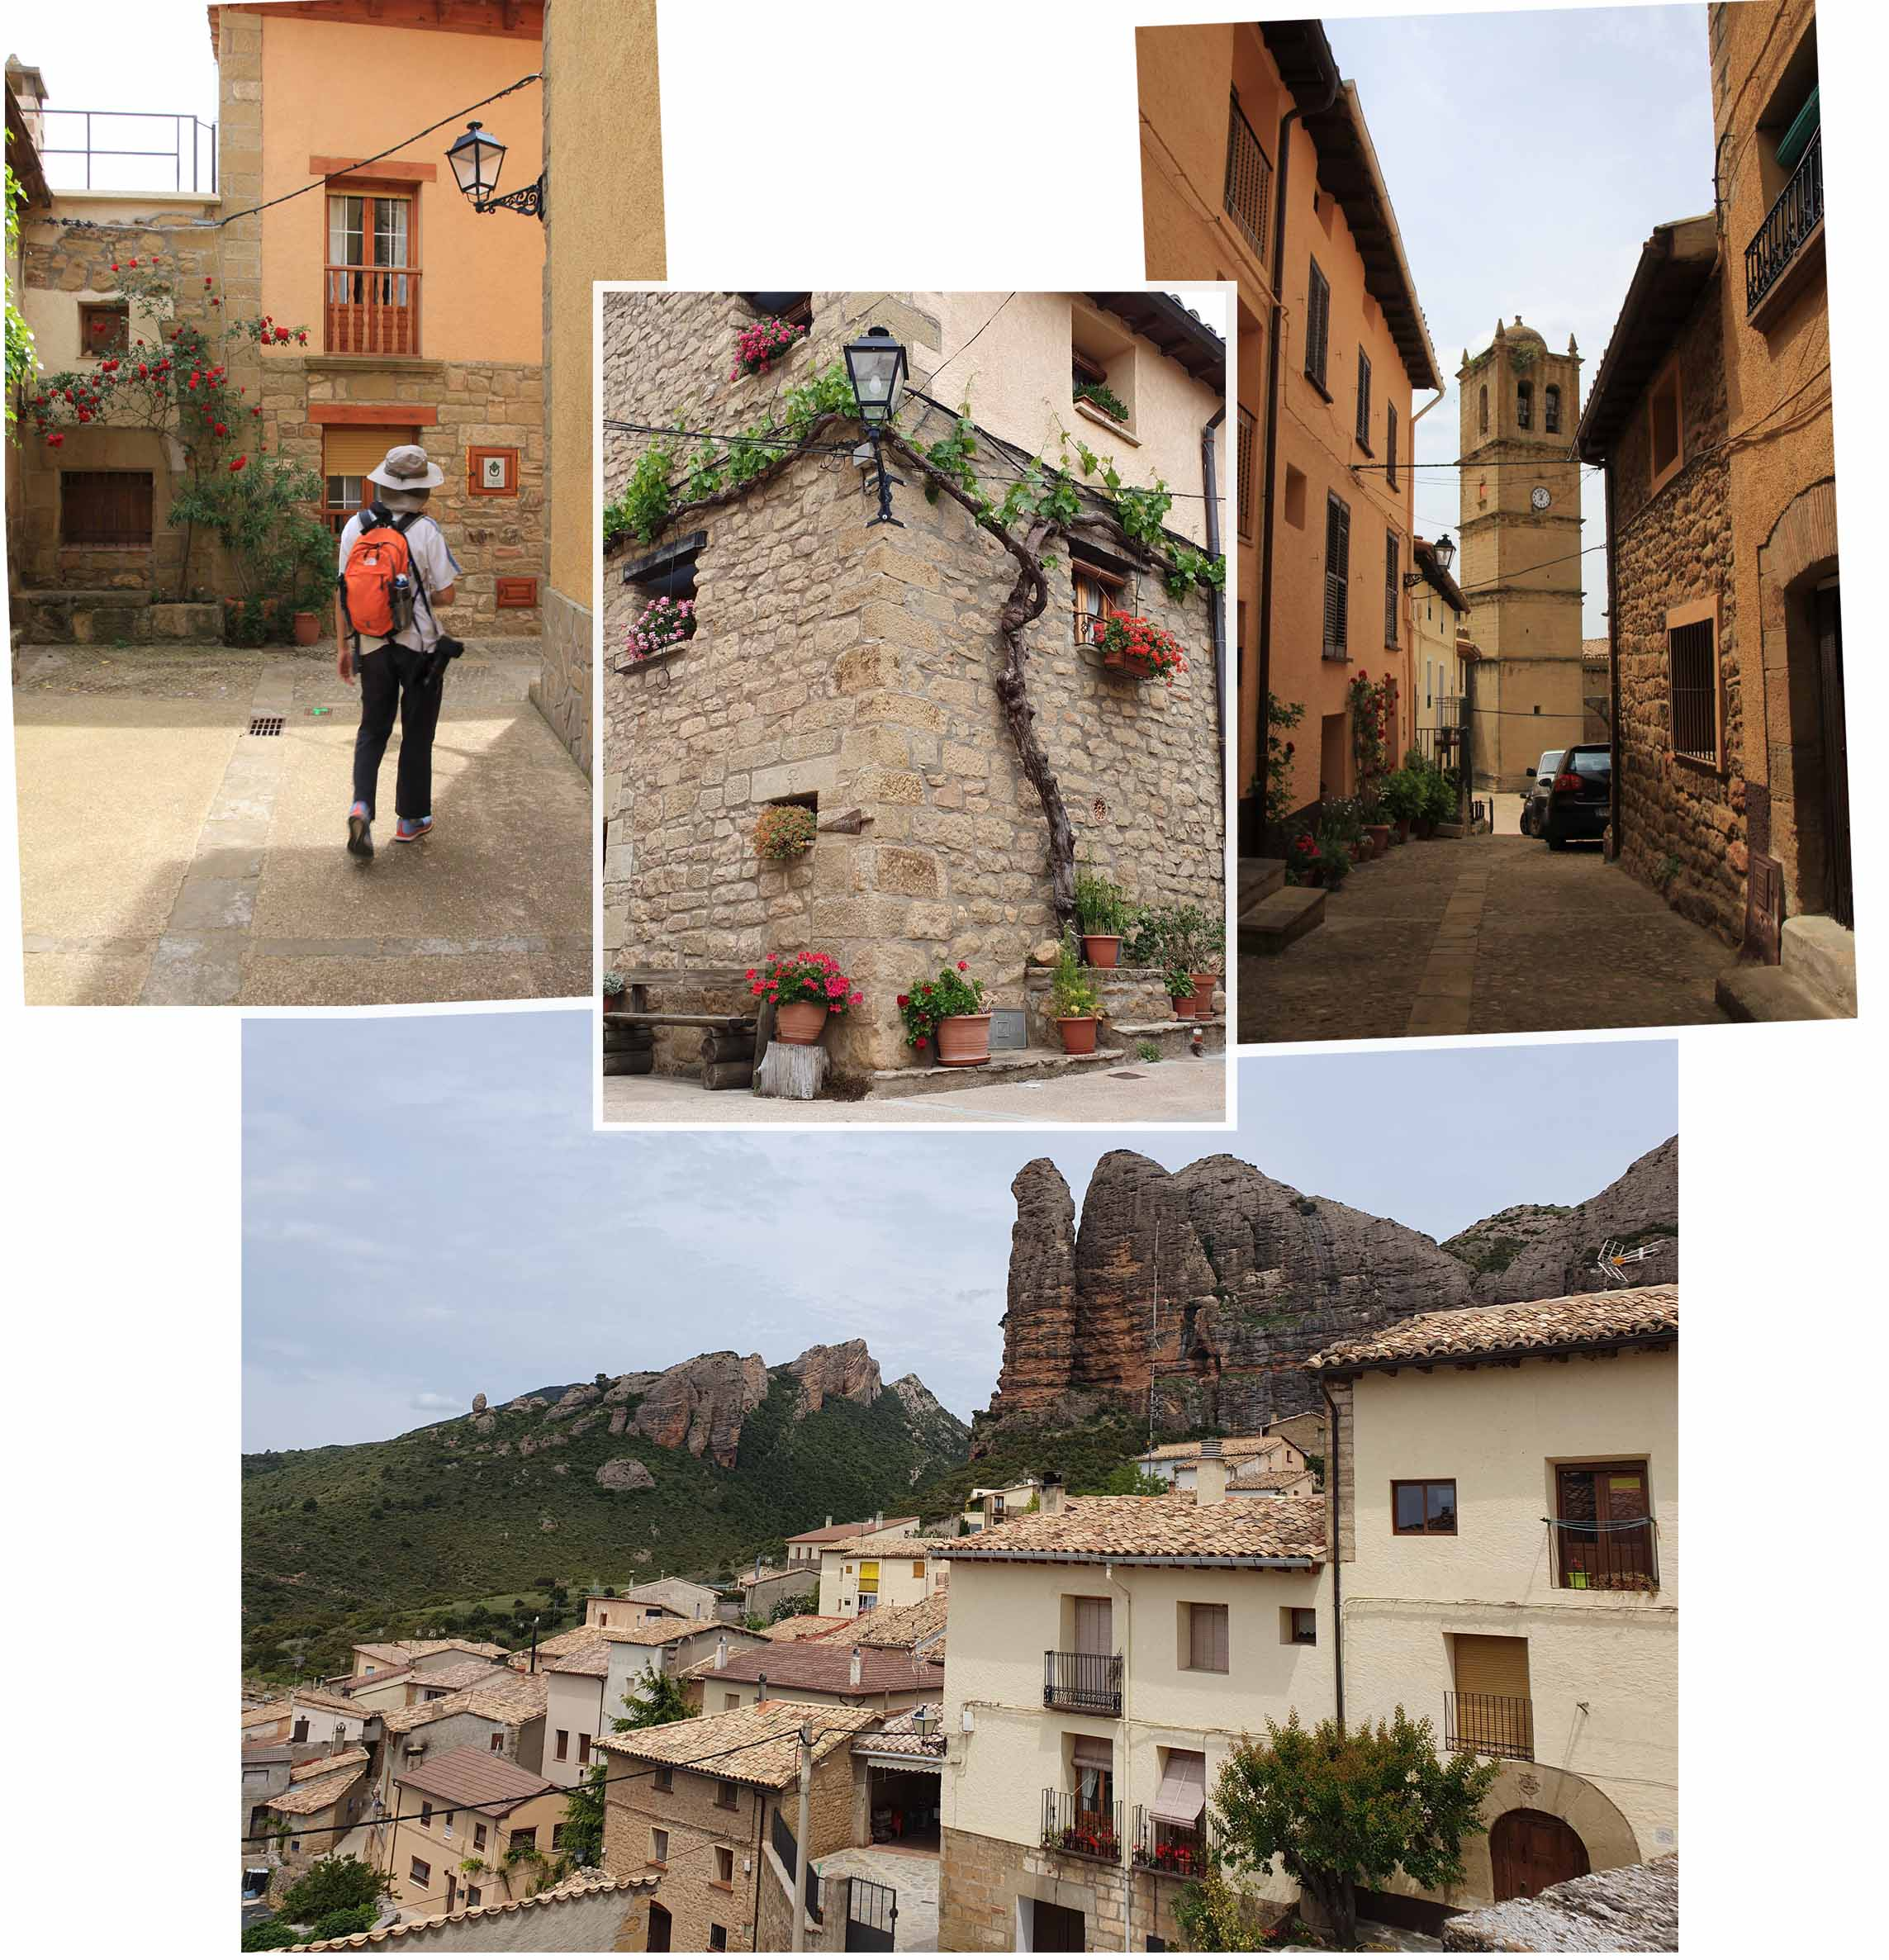 Aguero village